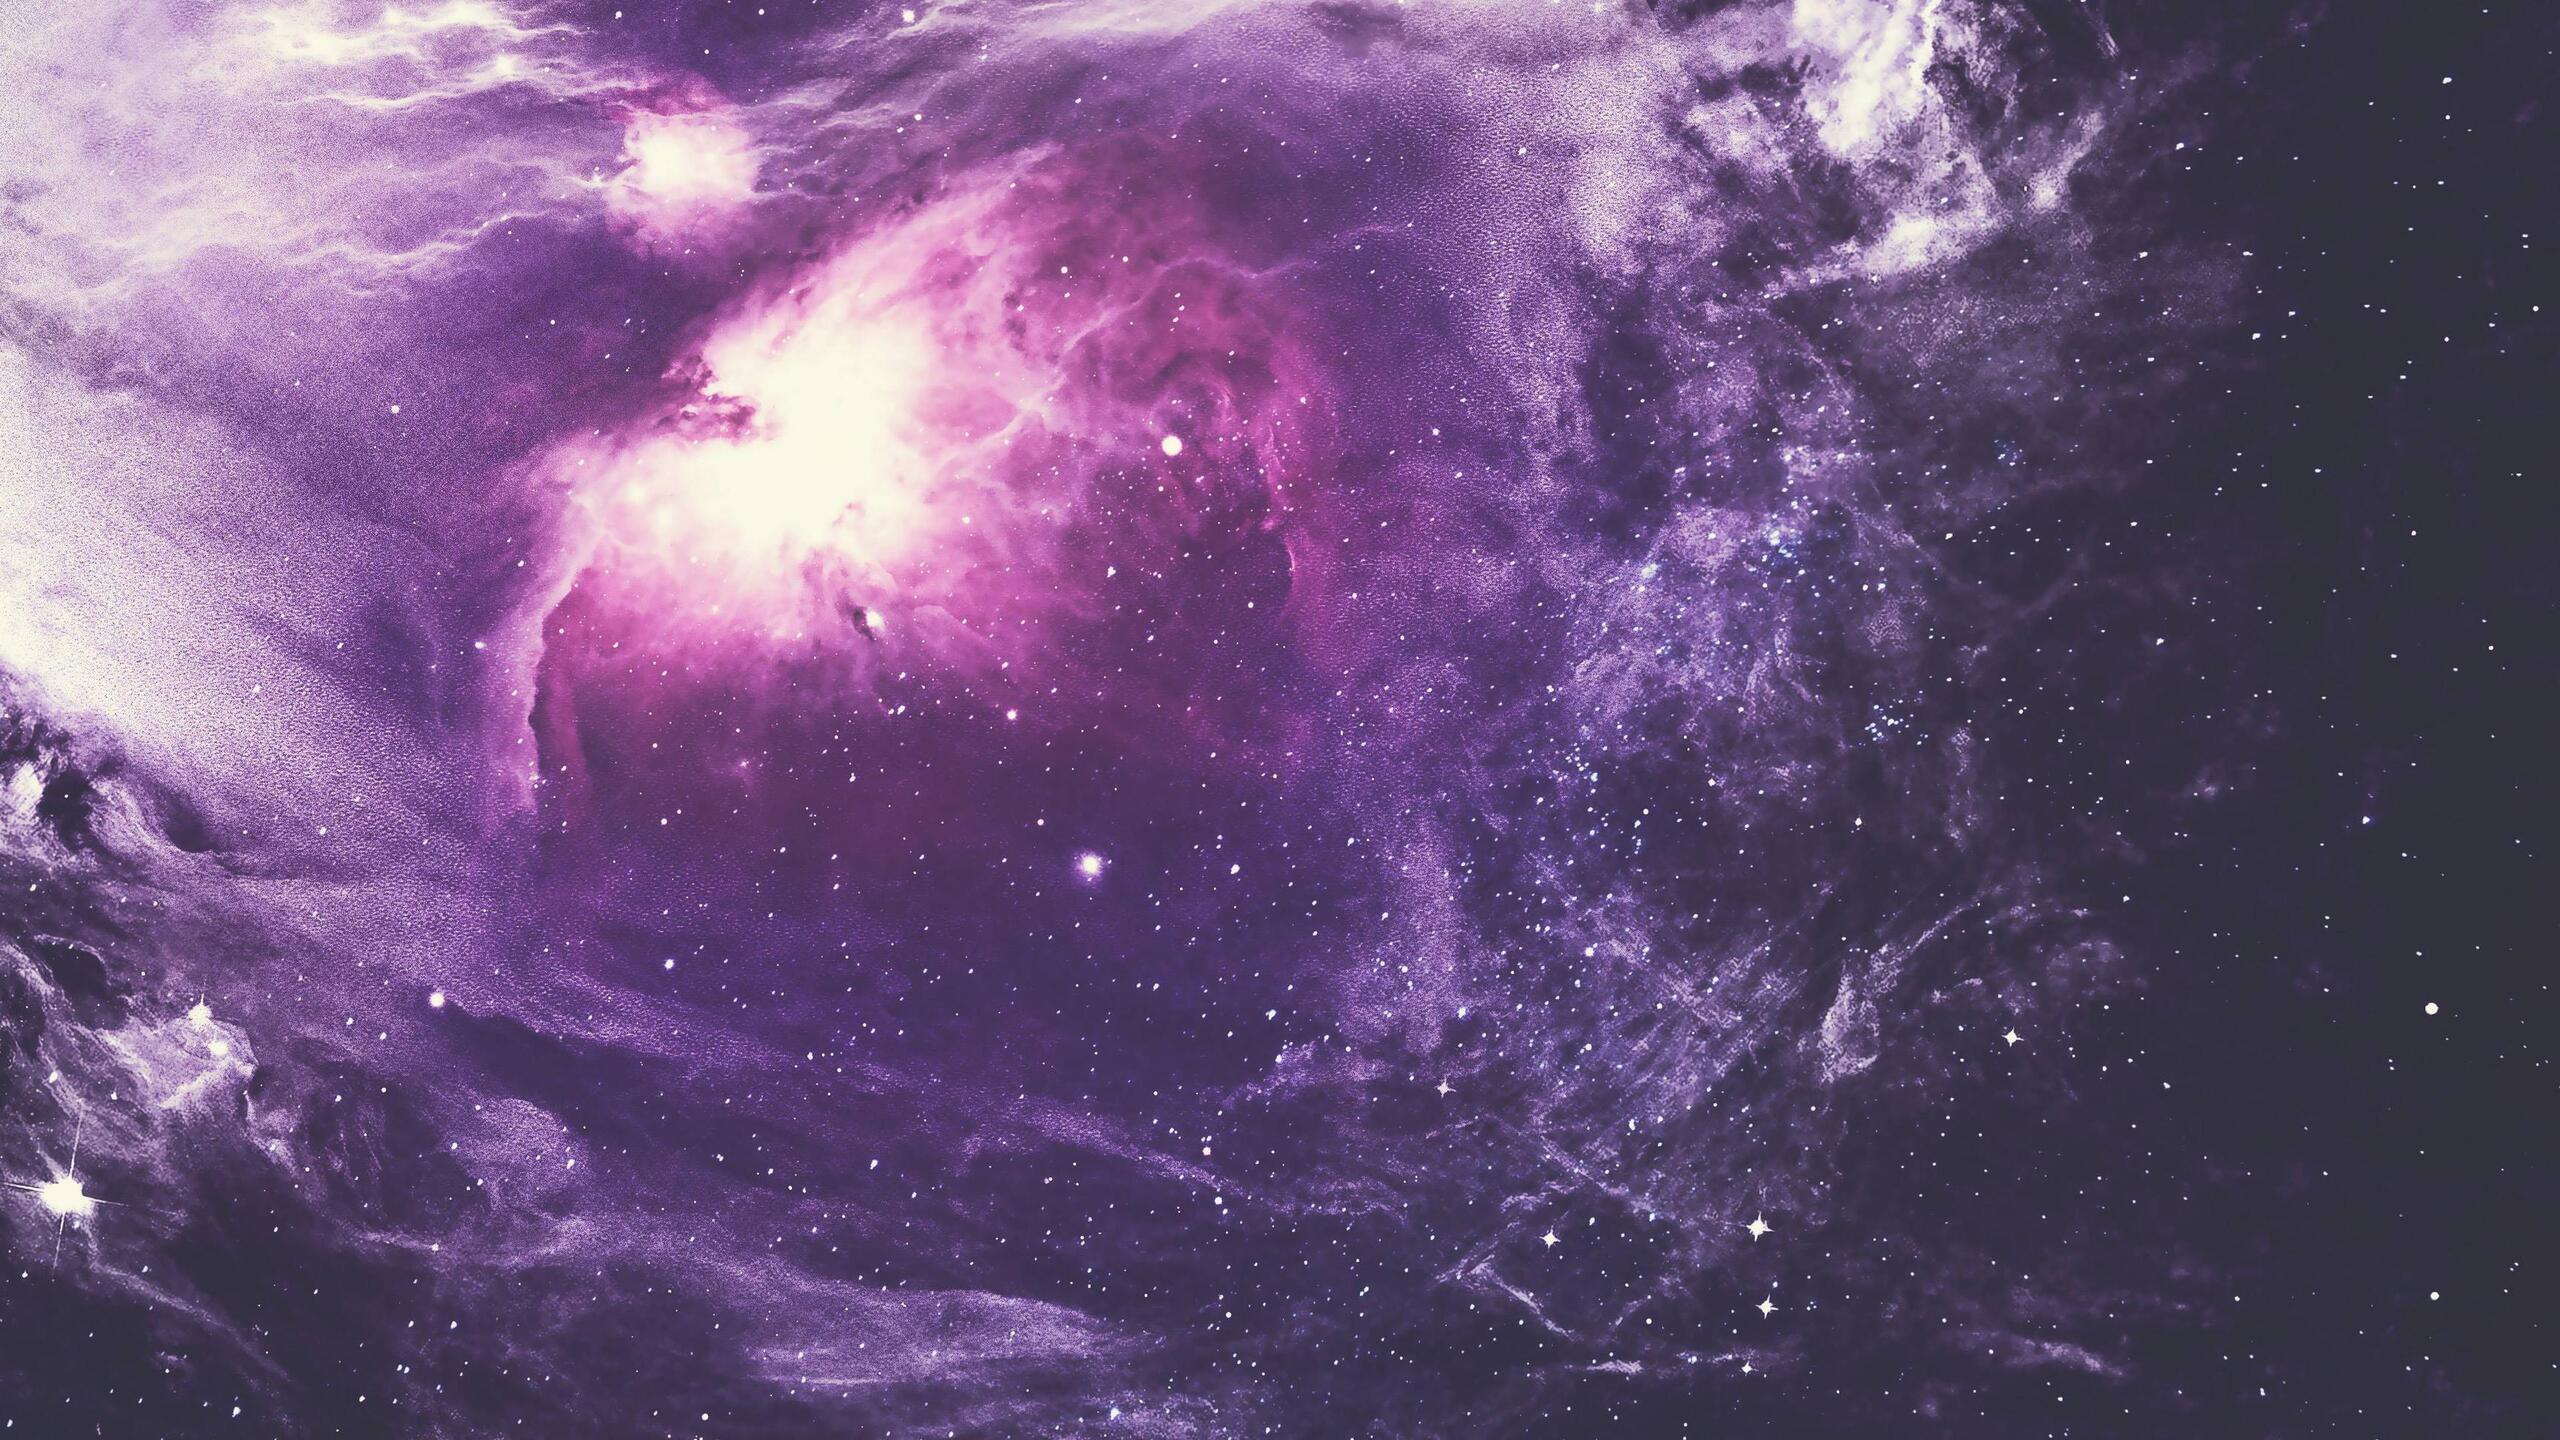 1440p Wallpaper Girls 2560x1440 Purple Nebula 4k 1440p Resolution Hd 4k